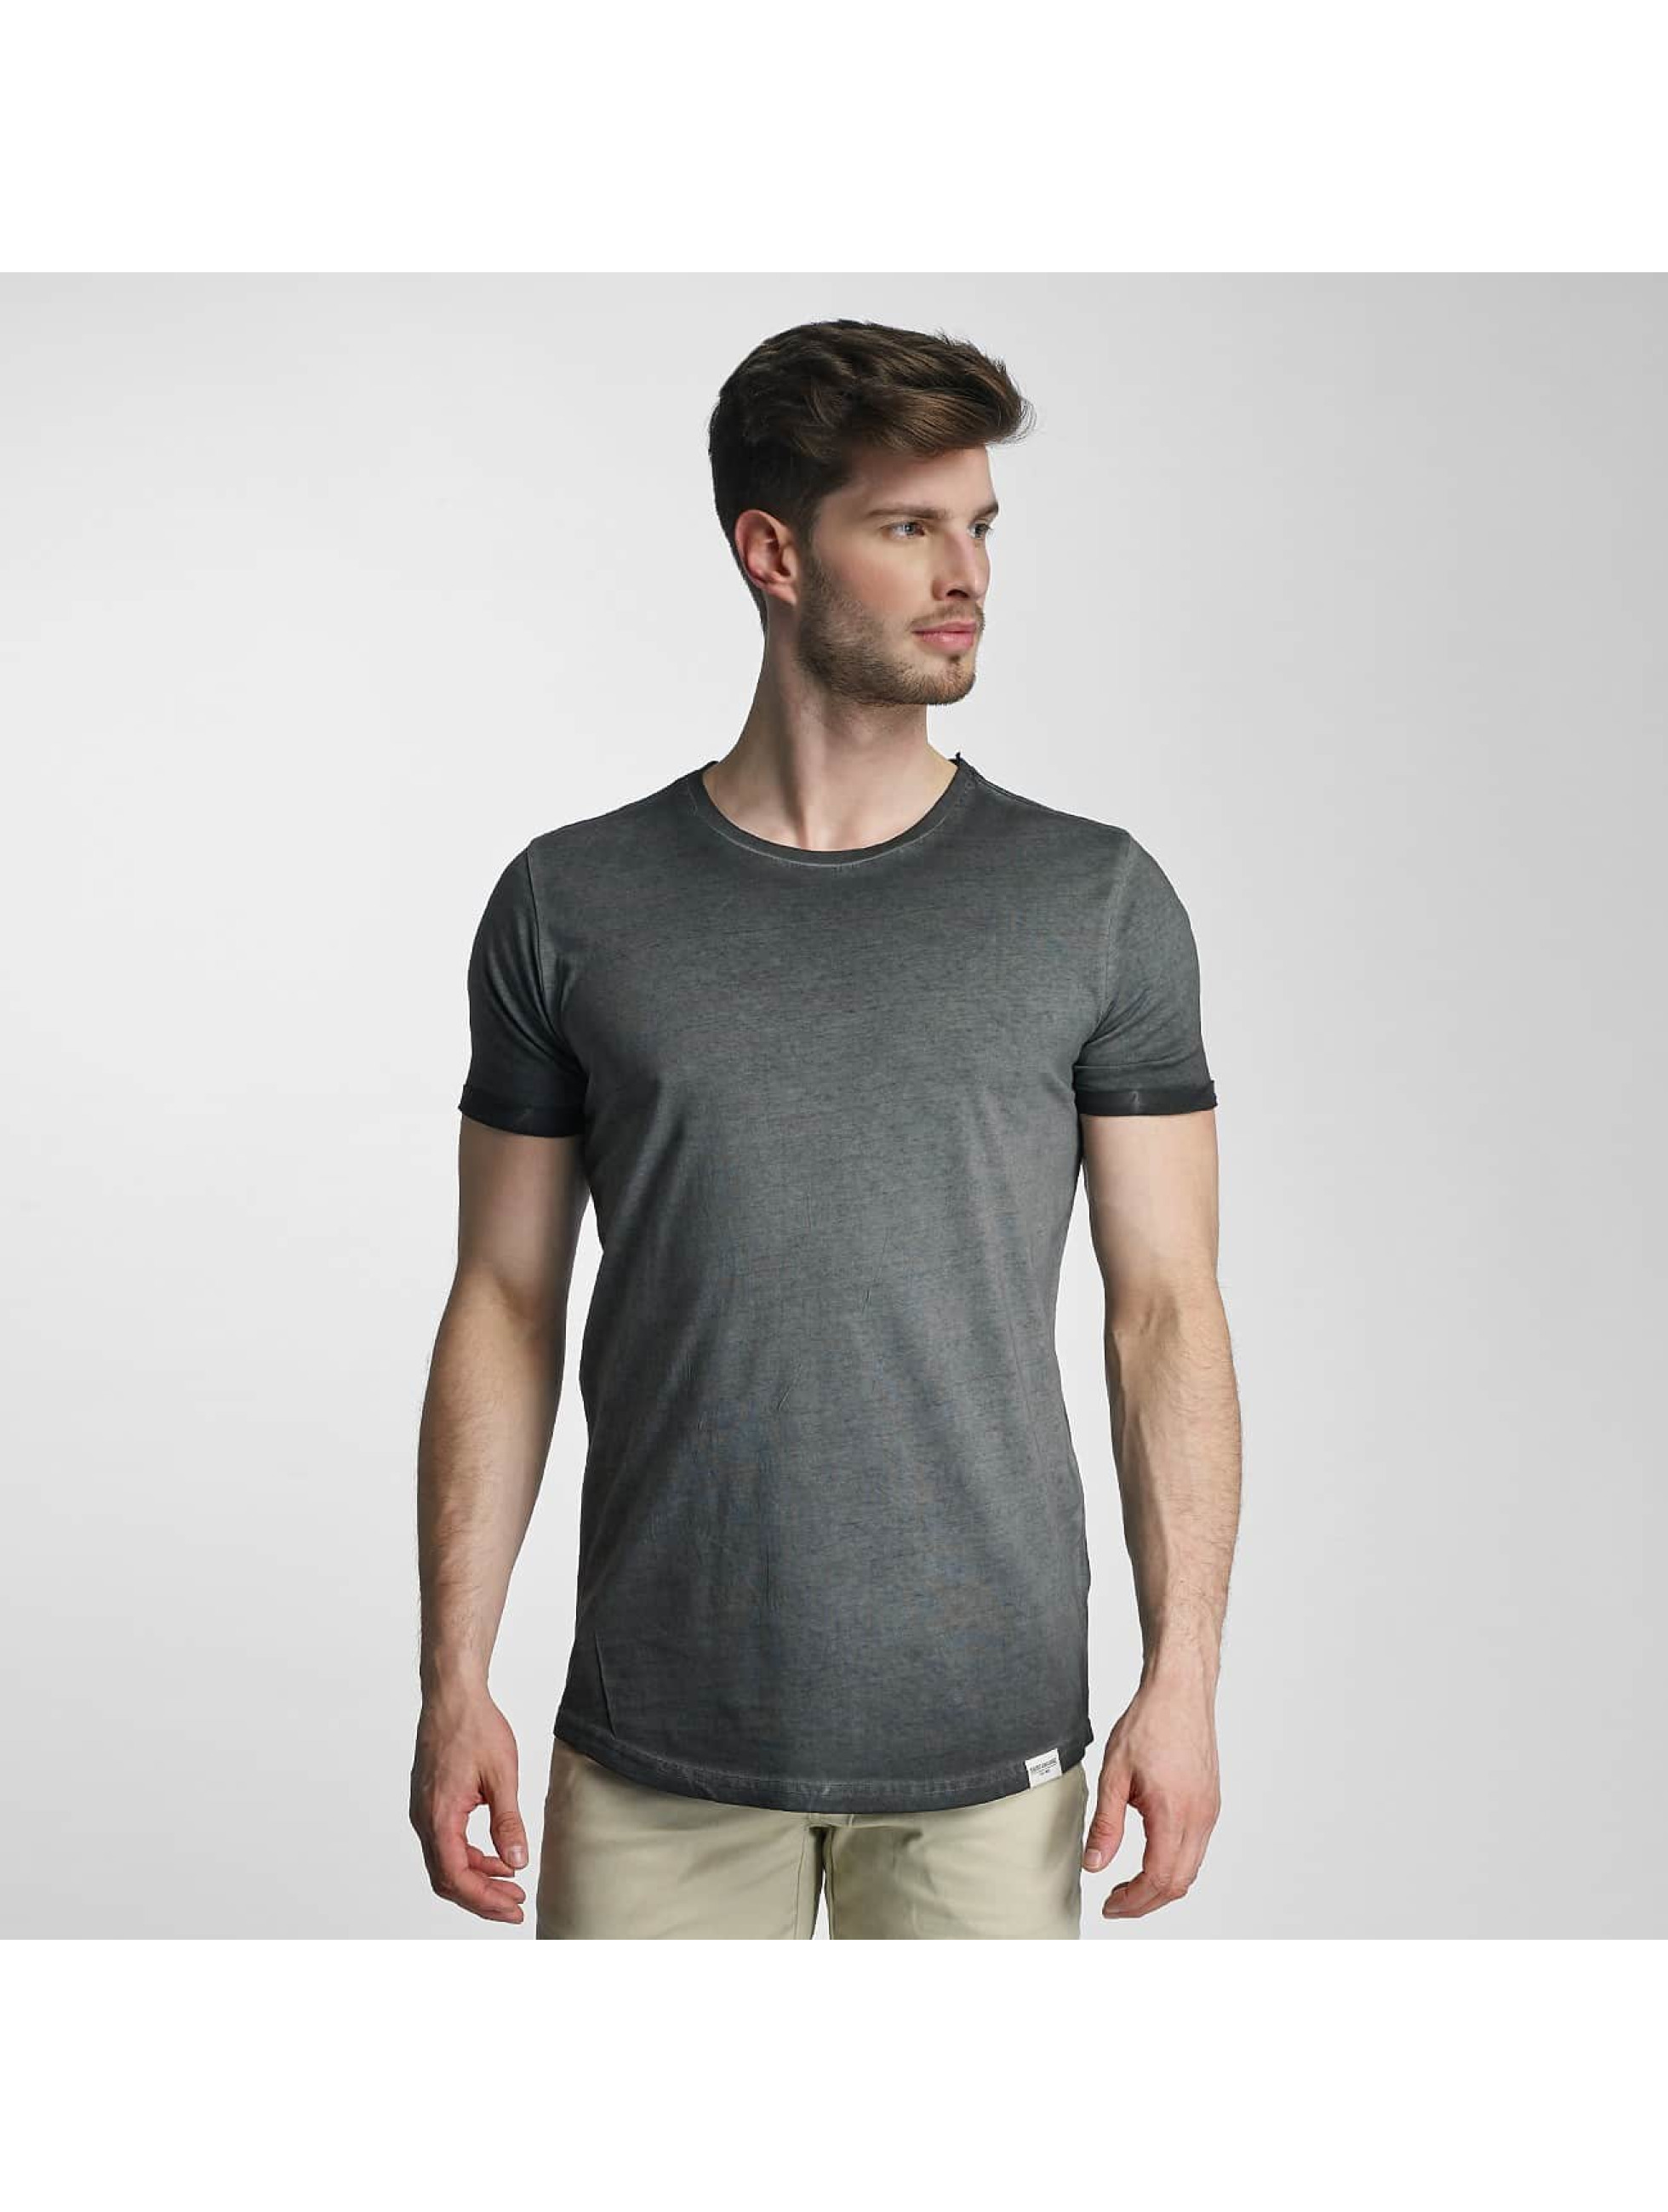 SHINE Original T-shirt Dirt Dye Wash nero